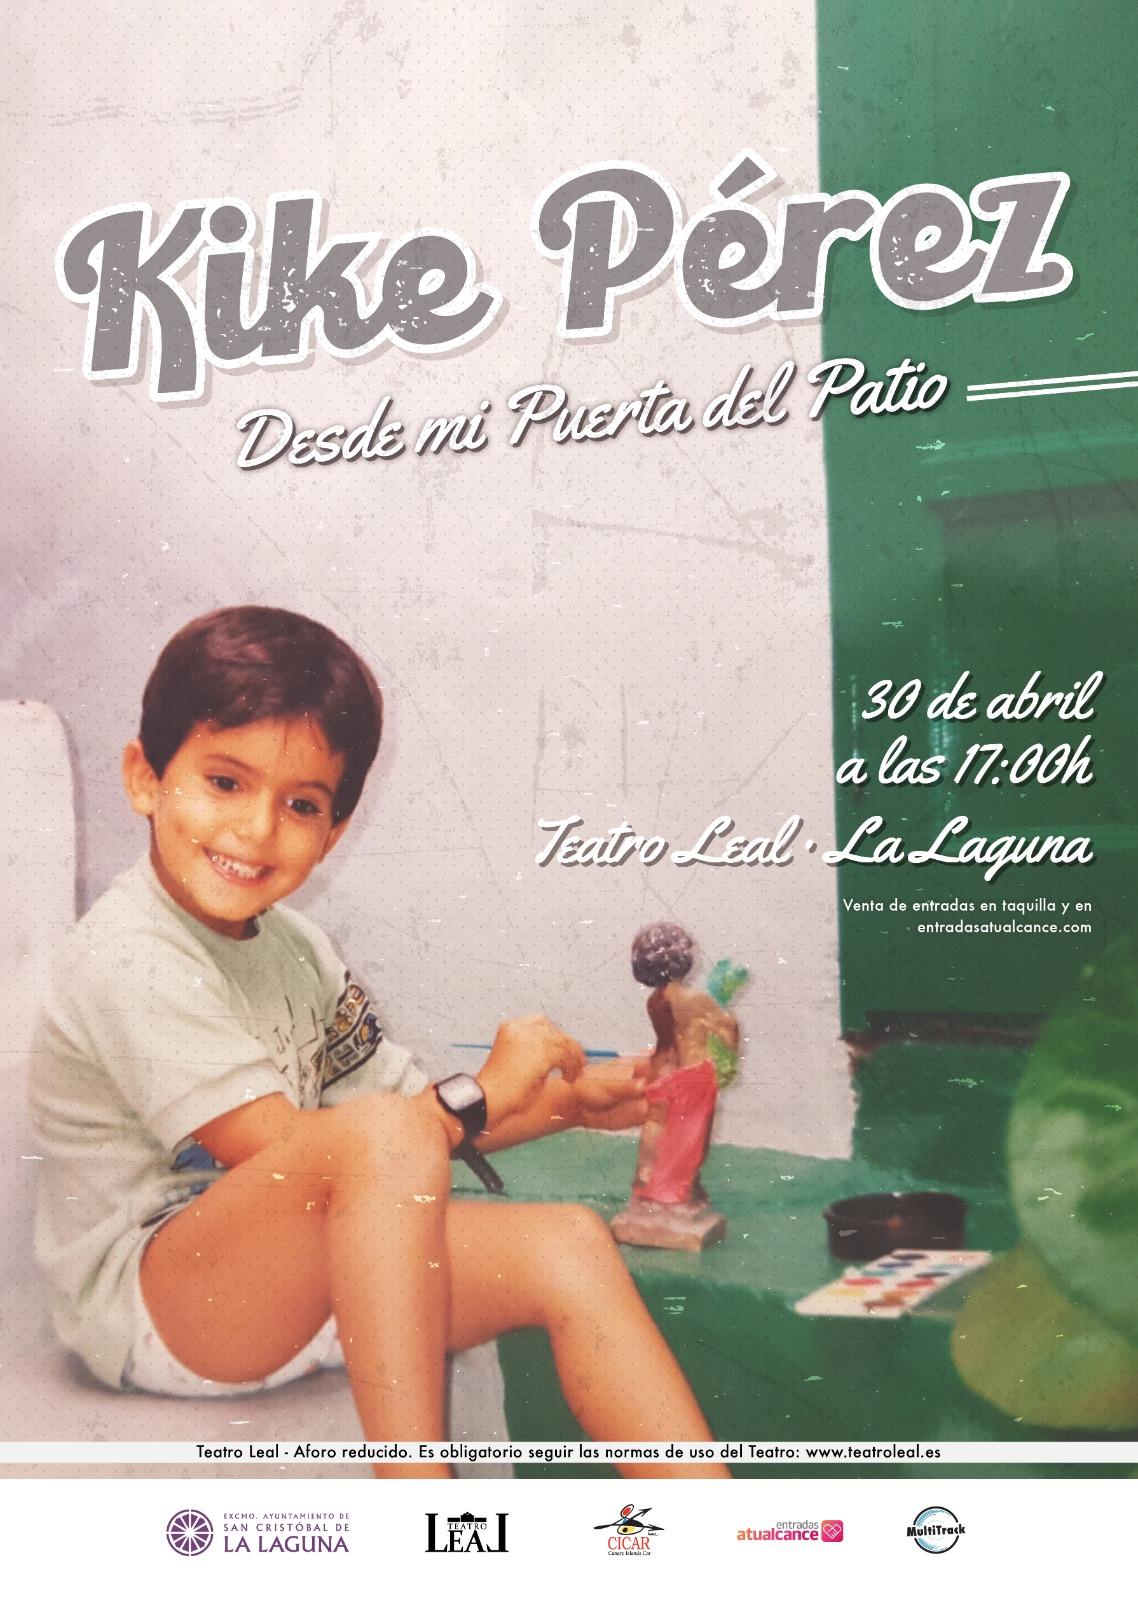 kike-perez-desde-mi-puerta-del-patio-teatro-leal-604b2bb623b26.jpeg